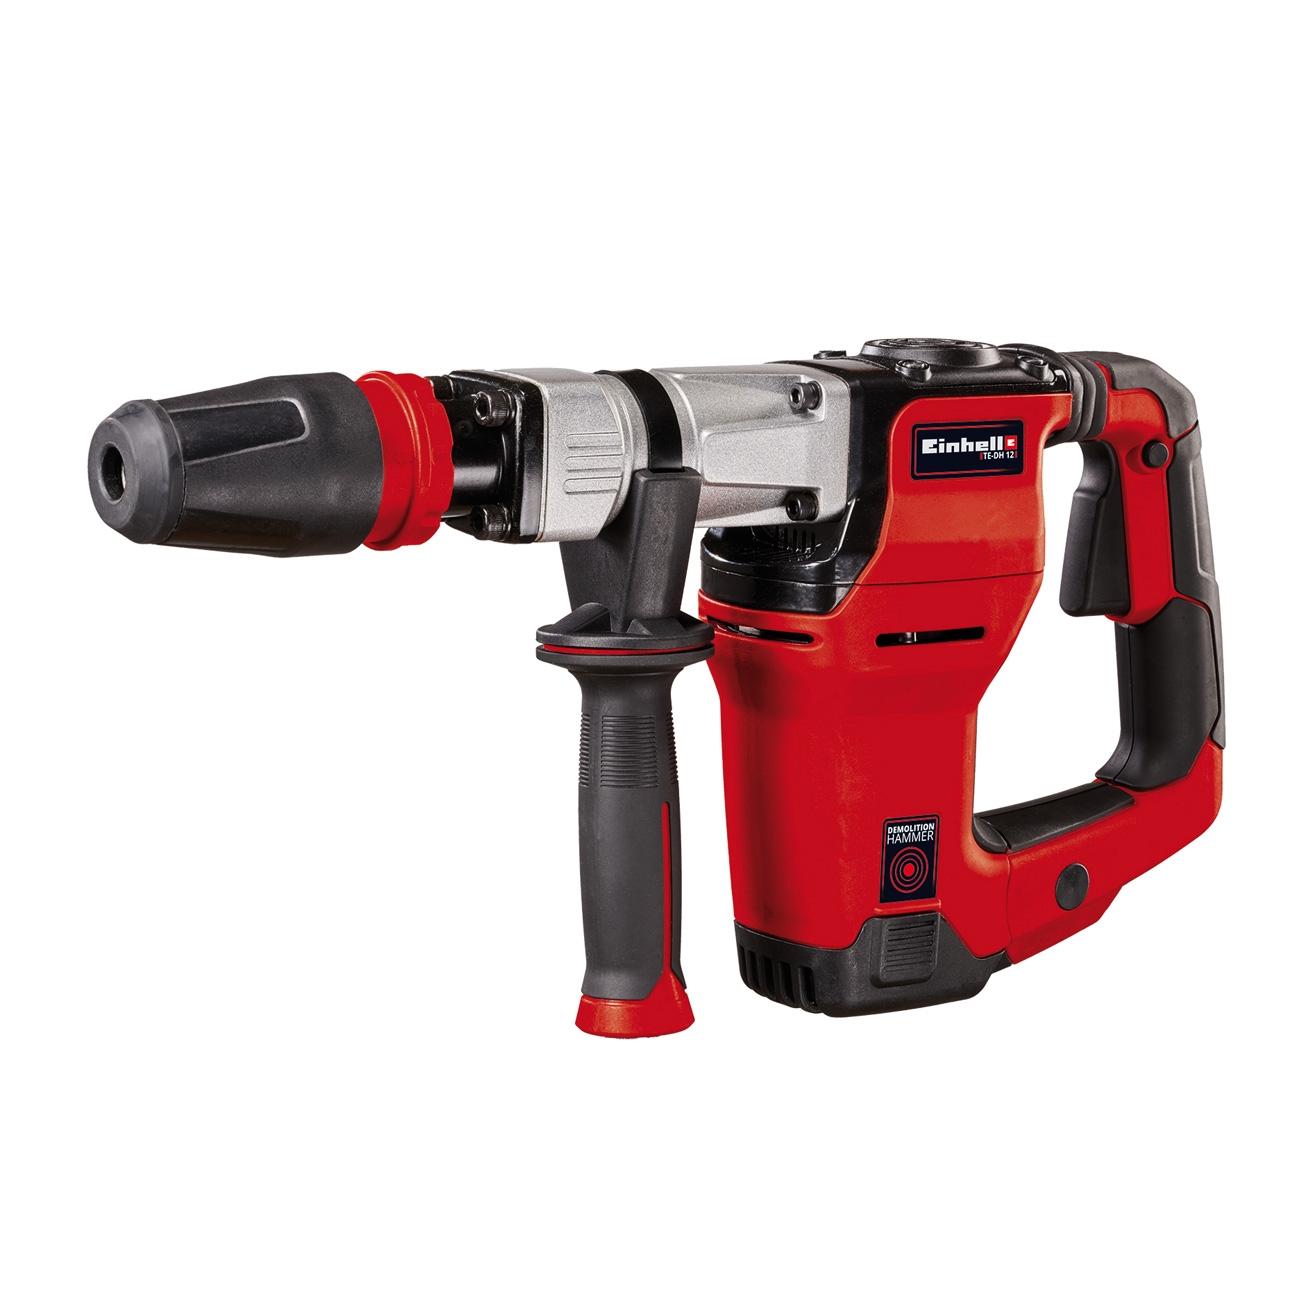 Einhell TE-DH 12 demolition hammer drill